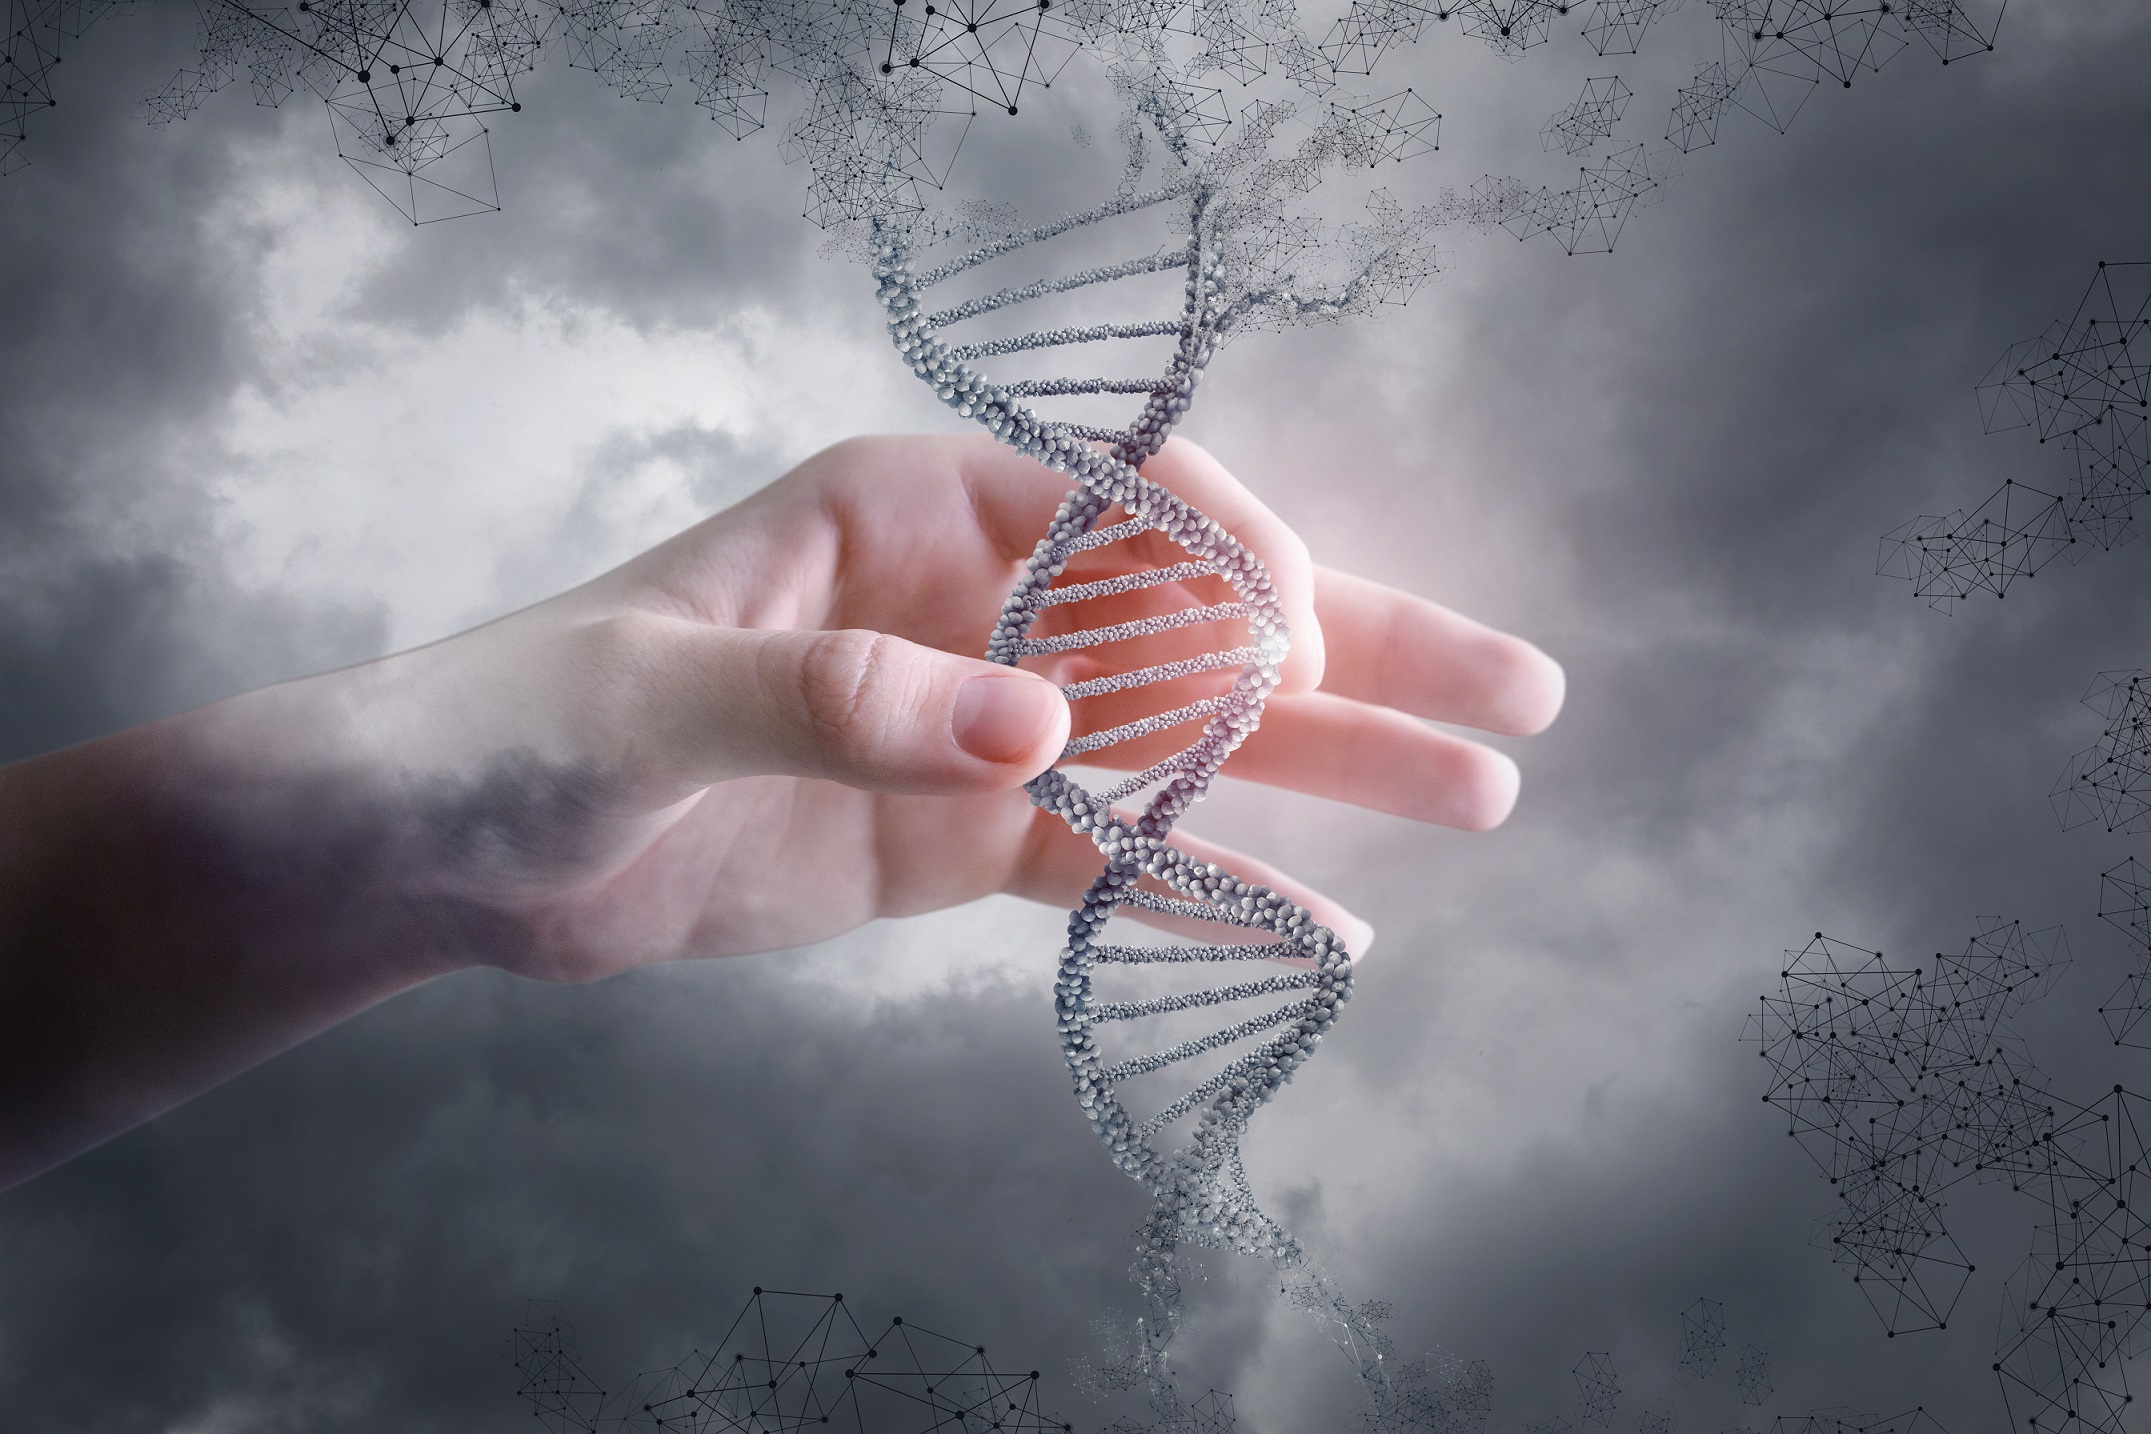 Neue Erbkrankheit entdeckt: Unbekannten Genmechanismus für Missbildungen entschlüsselt - Heilpraxisnet.de